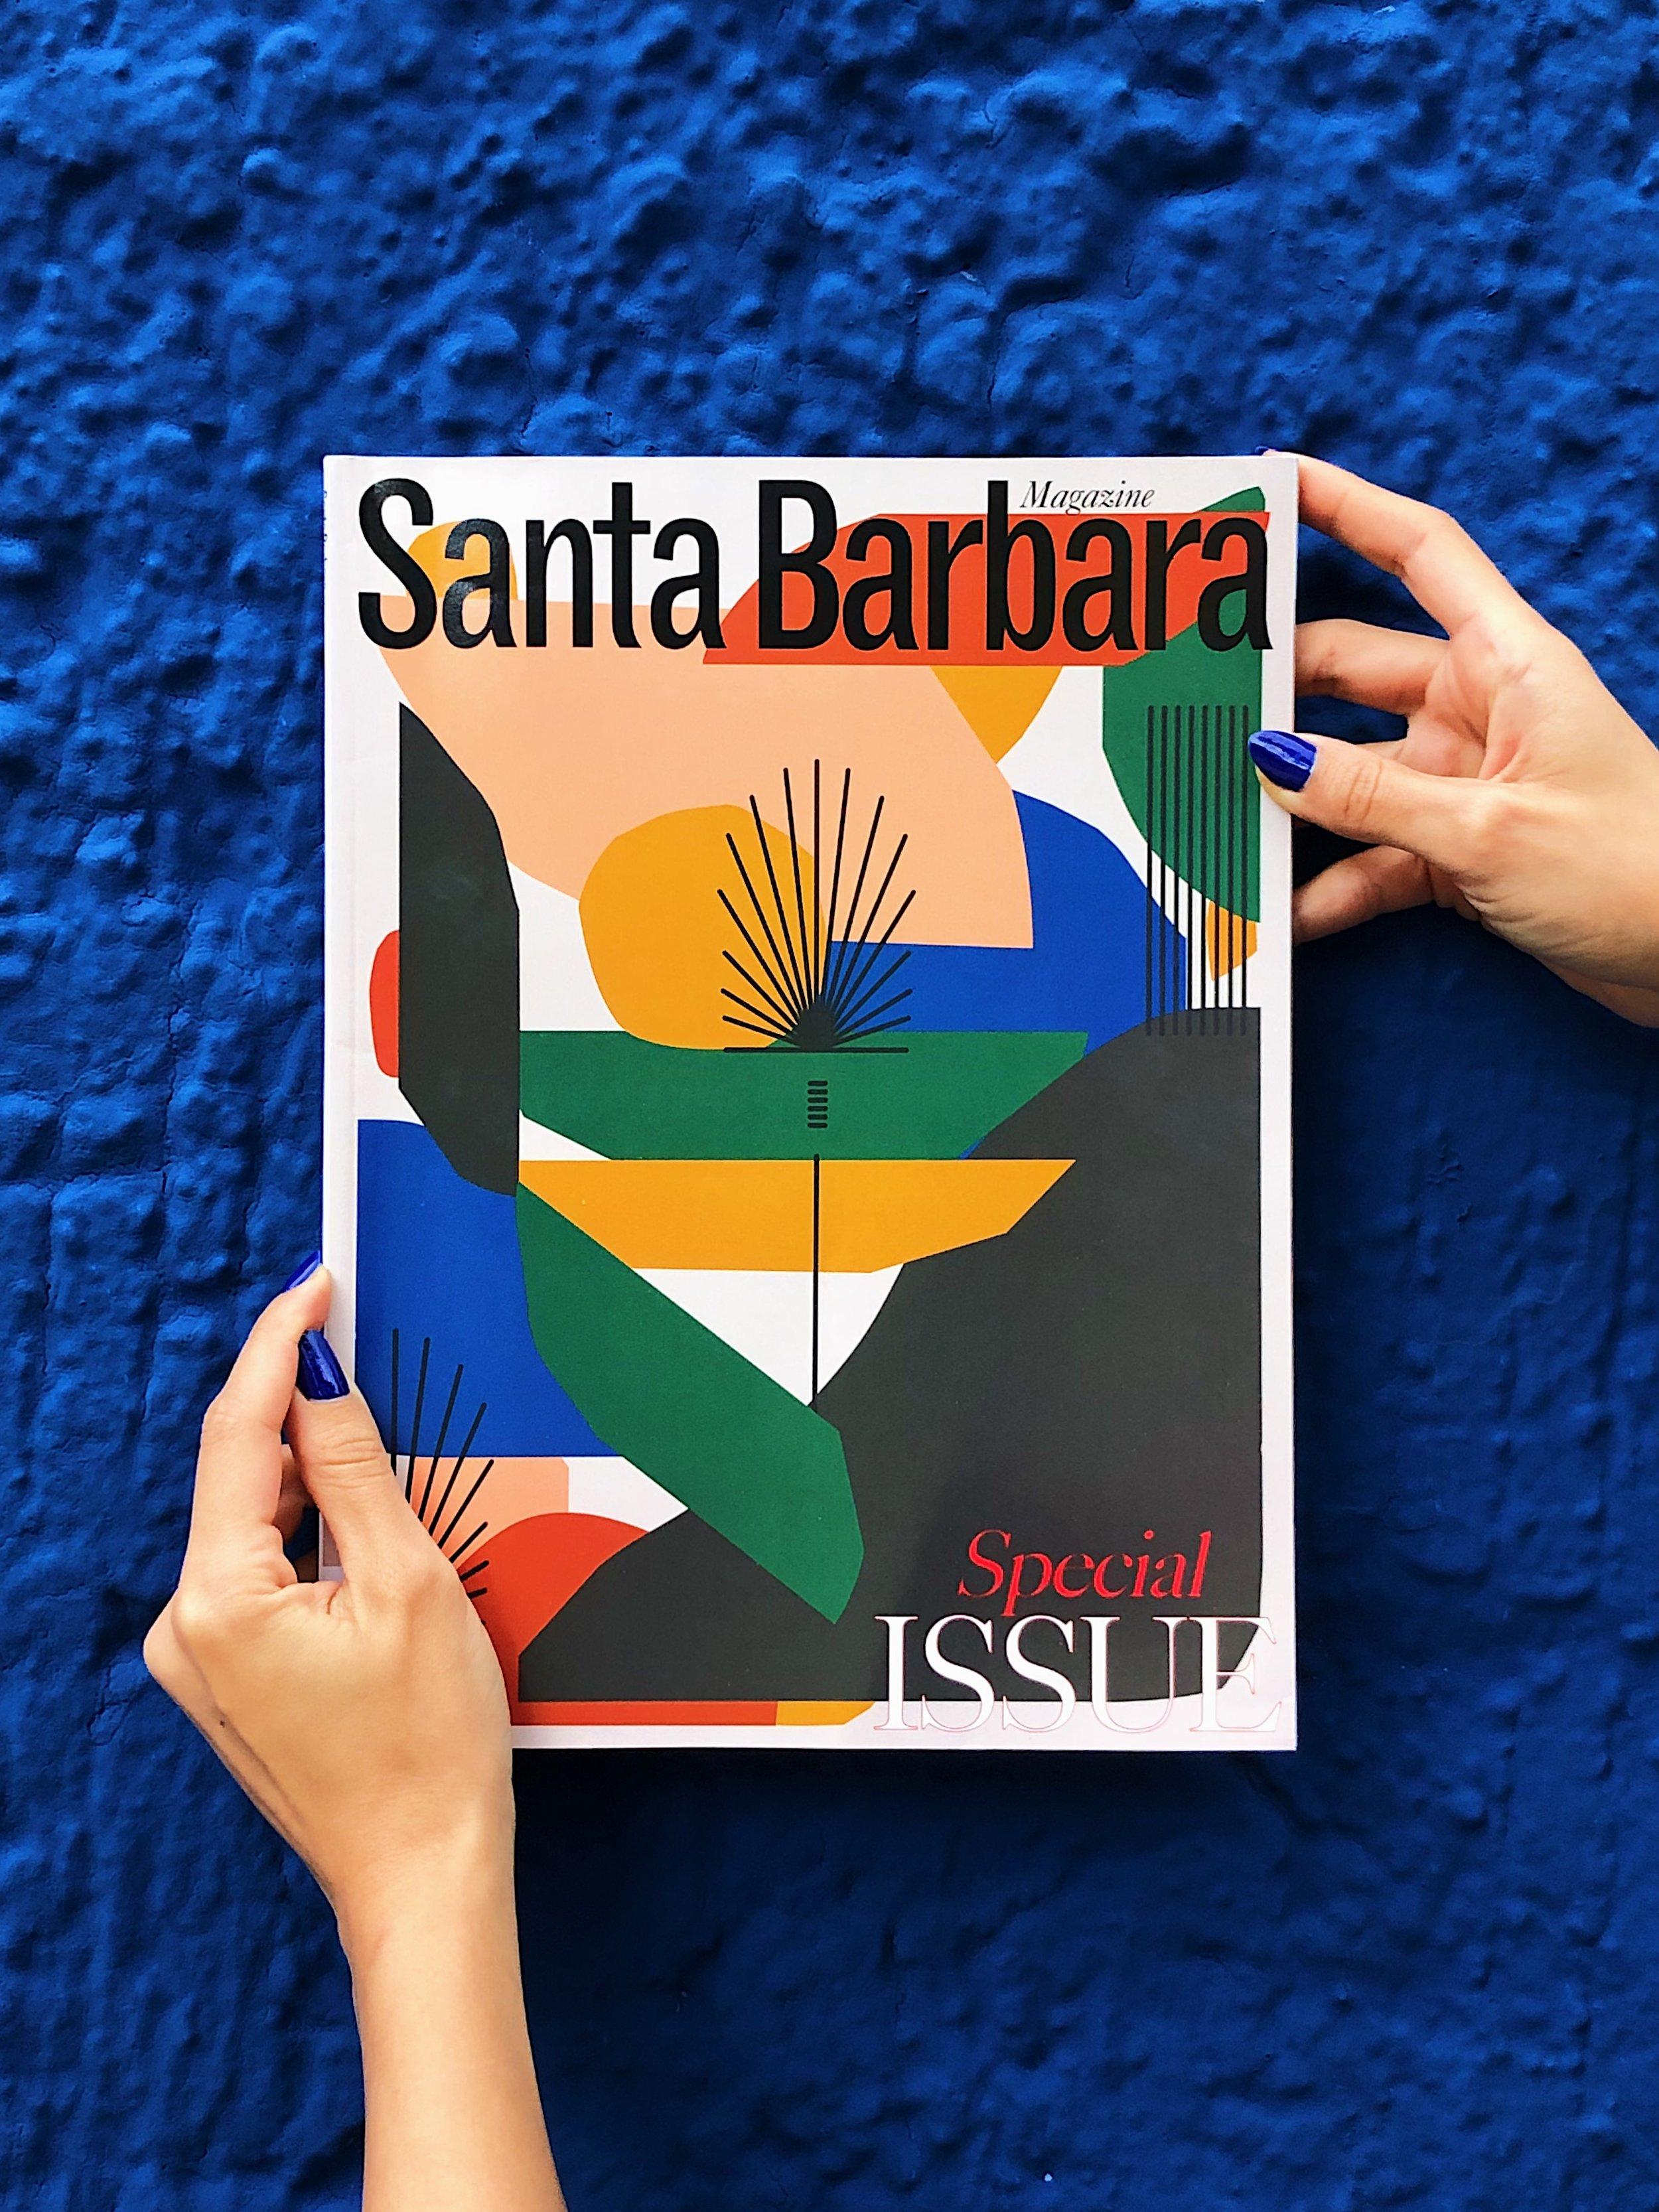 Santa Barbara Magazine Cover Art by Hola Lou®